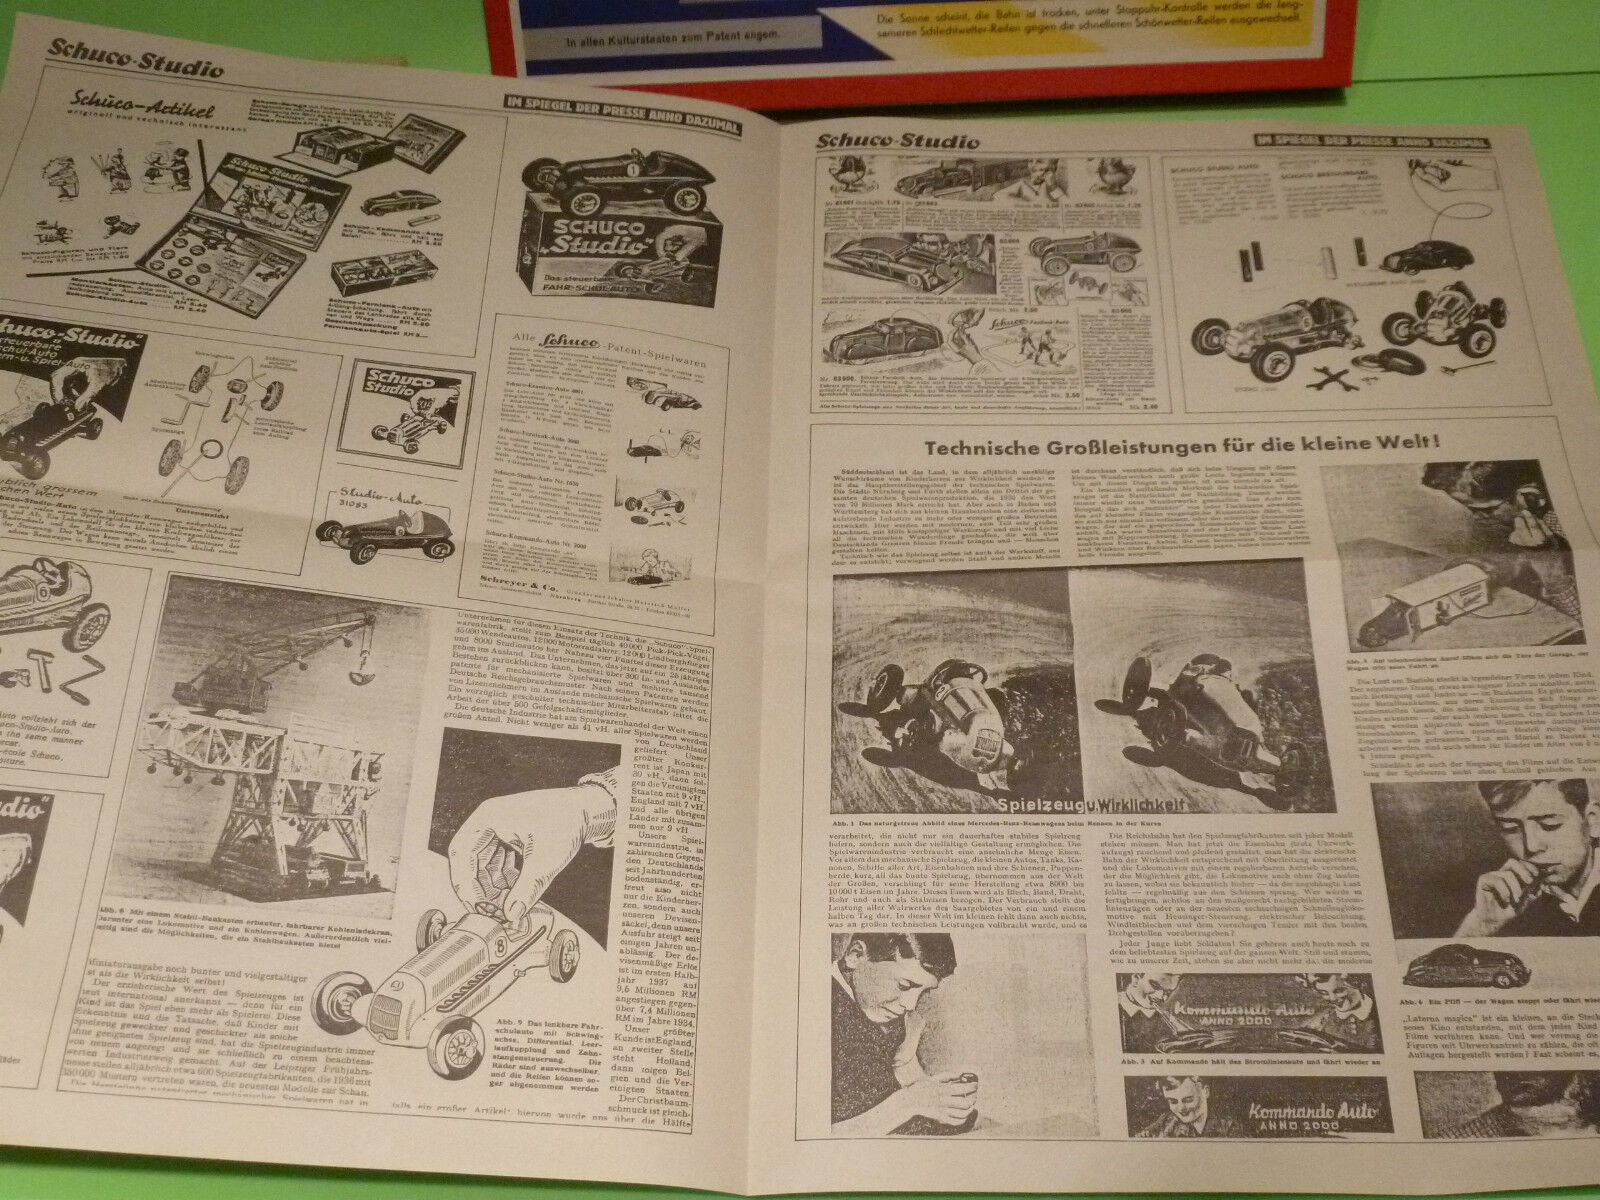 SCHUCO 1055 REPLICA ORIGINAL STUDIO BAUKASTENS VON 1936 - - - RARE SELTEN - MIB 8edeed